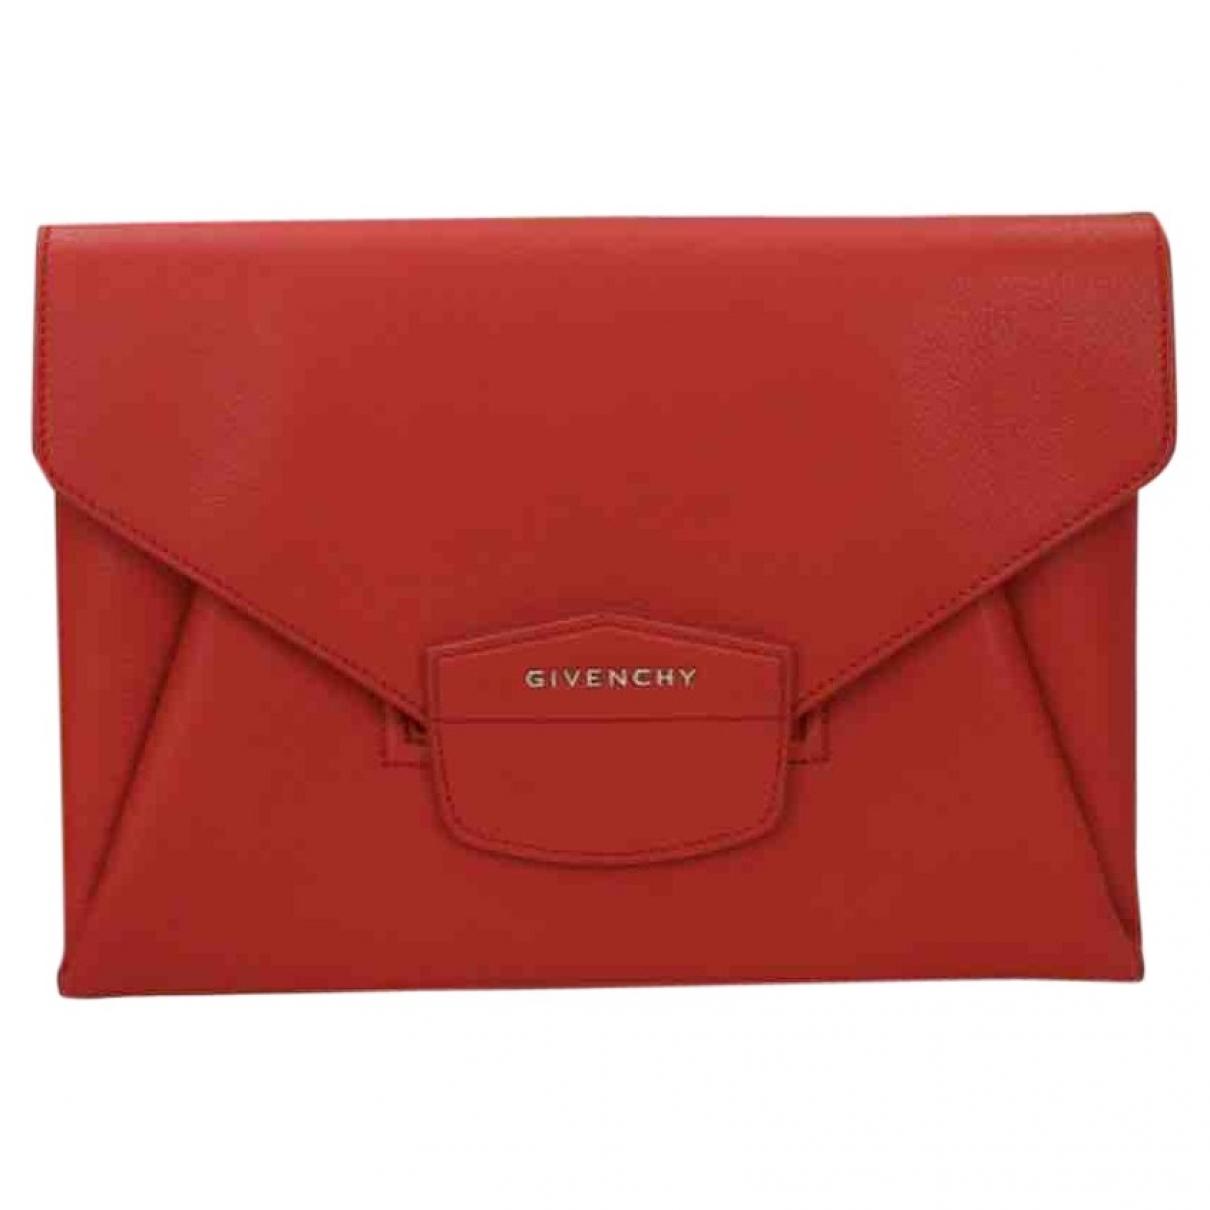 Pochette Nightingale de Charol Givenchy